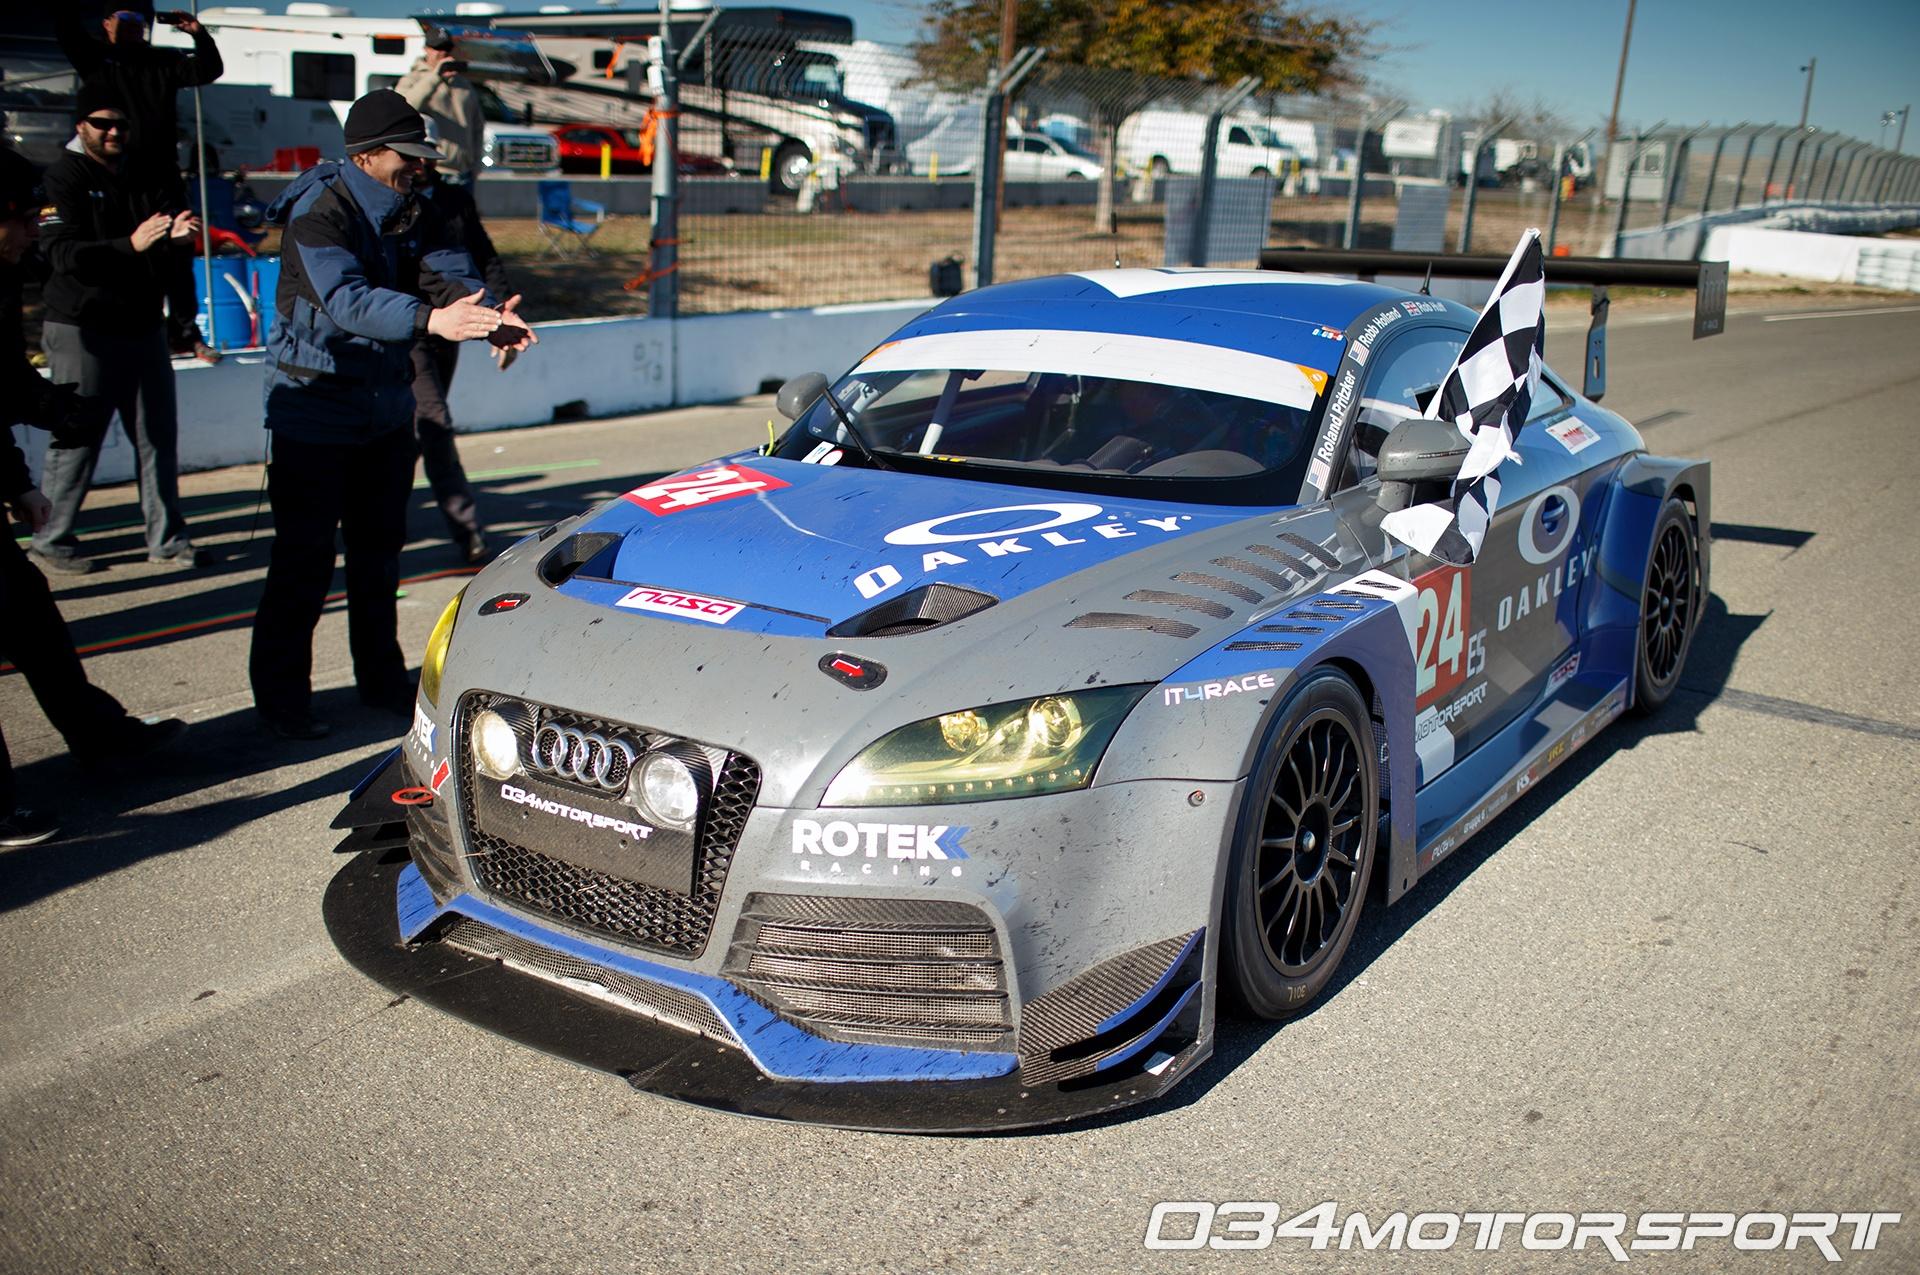 034Motorsport_Rotek_Racing_25_Hours_of_Thunderhill_09.jpg